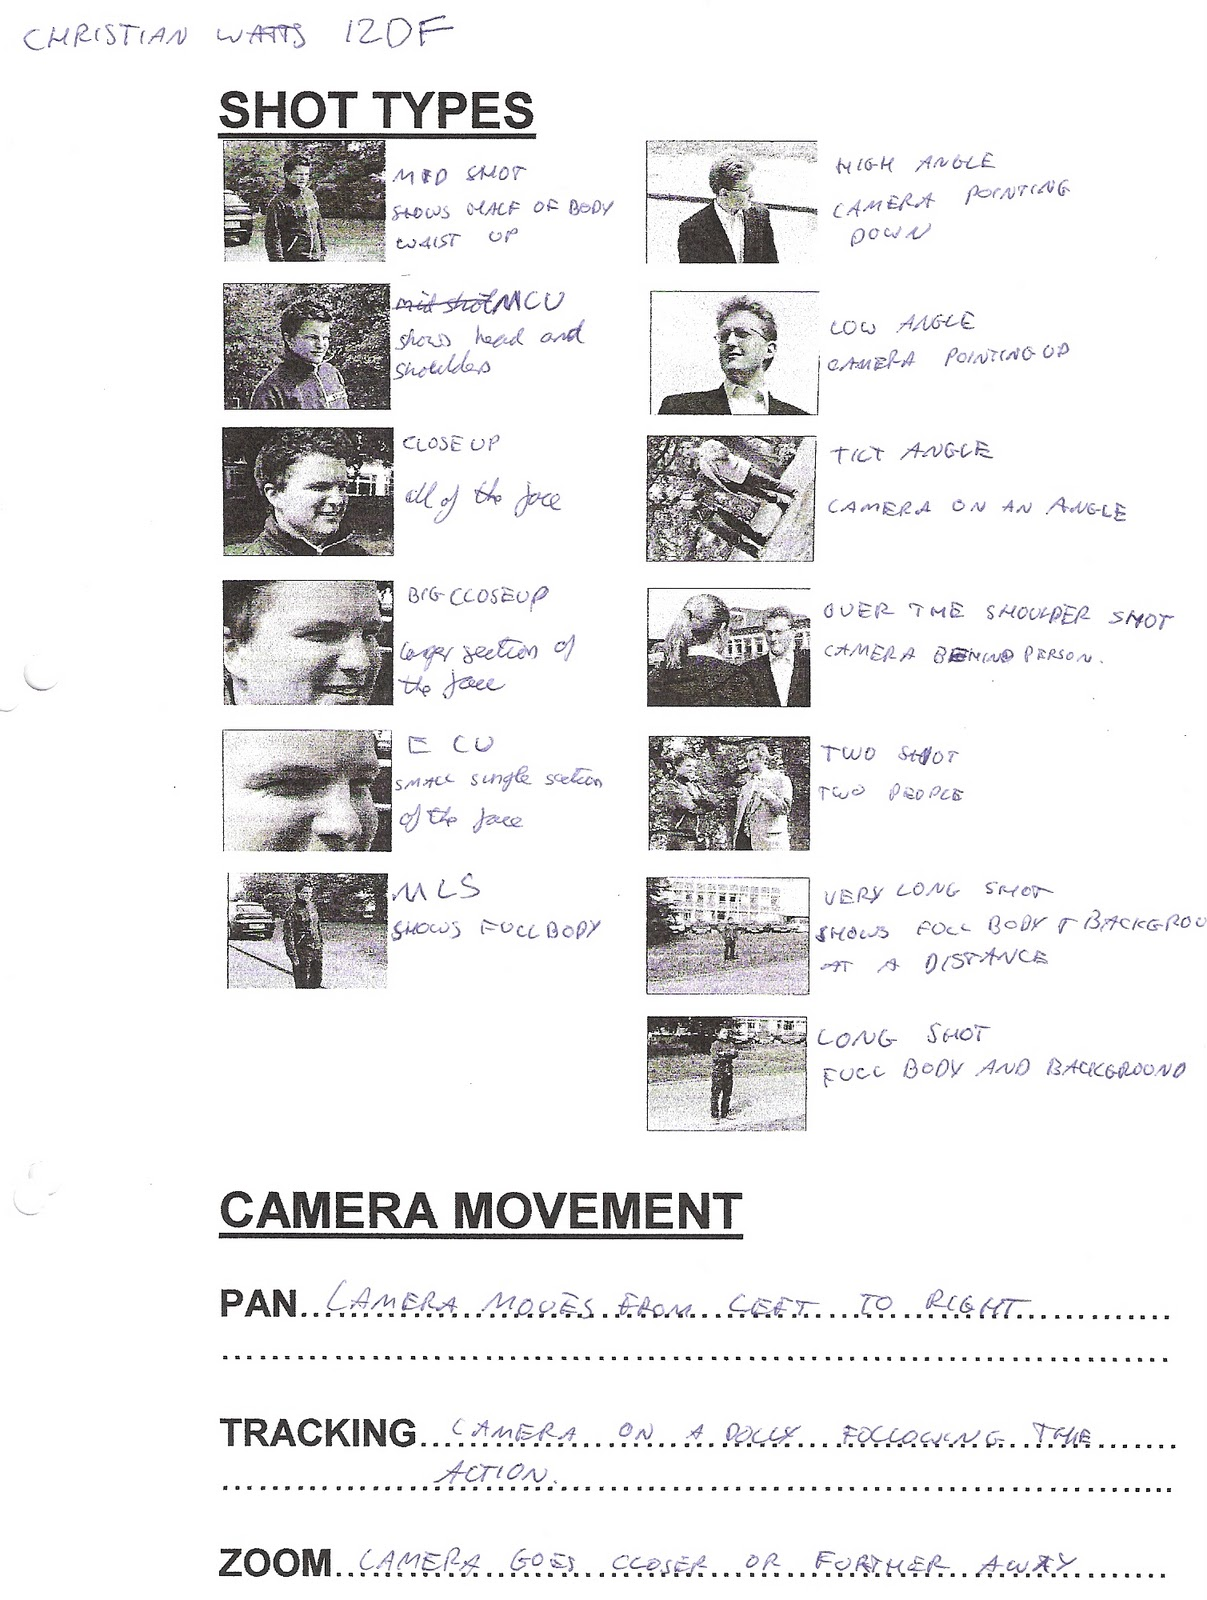 Chris Watts As Media Camera Shots